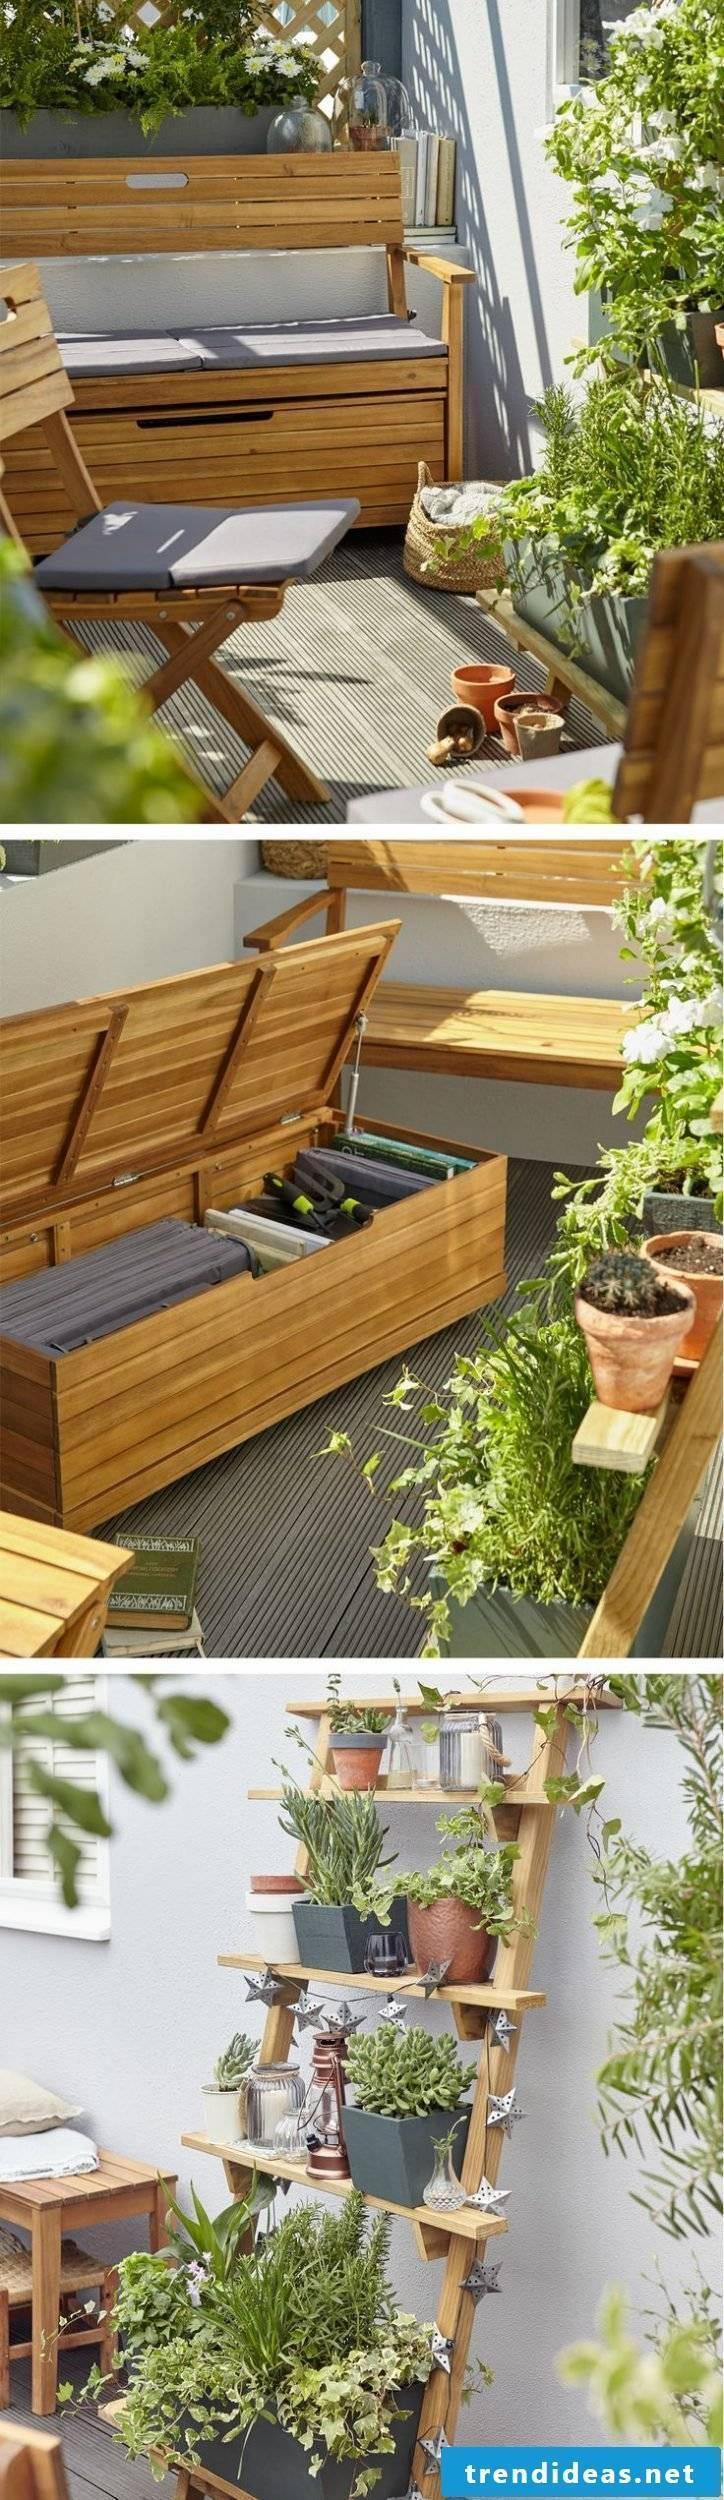 Terraces and garden design Ideas to imitate